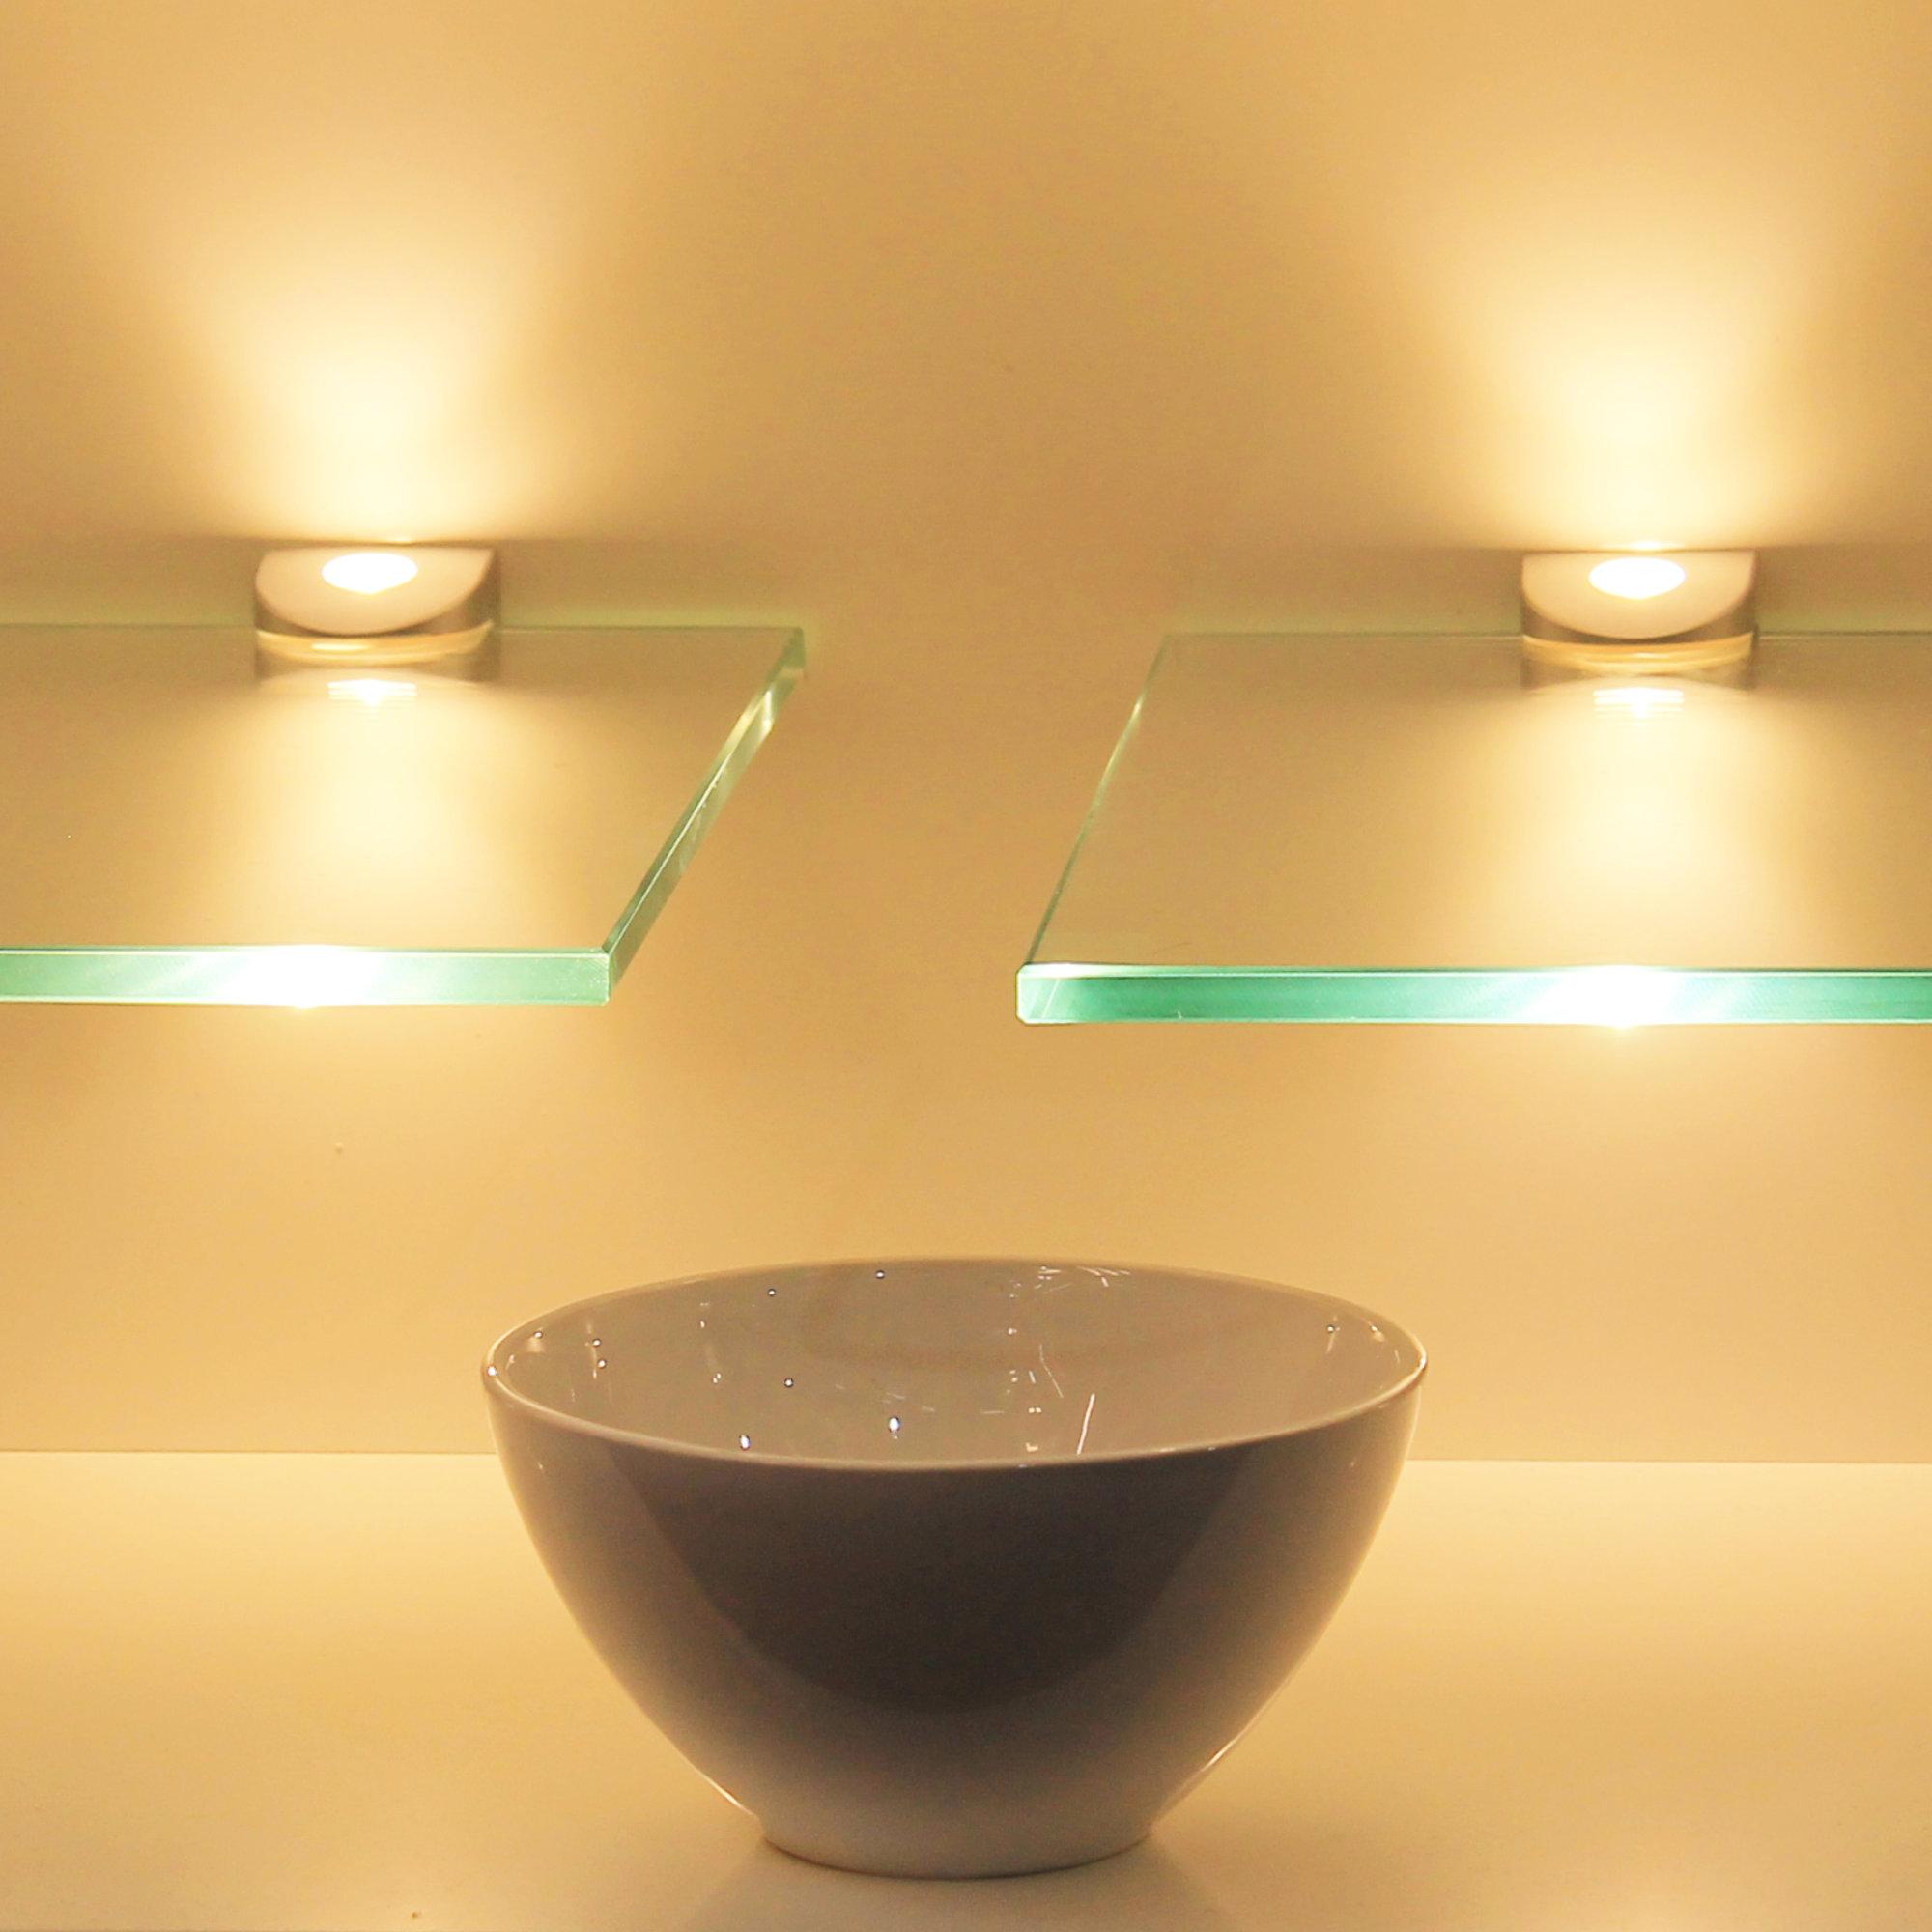 Detalles de LED Estante de Vidrio Panel Pared Colgante Estantería Iluminado